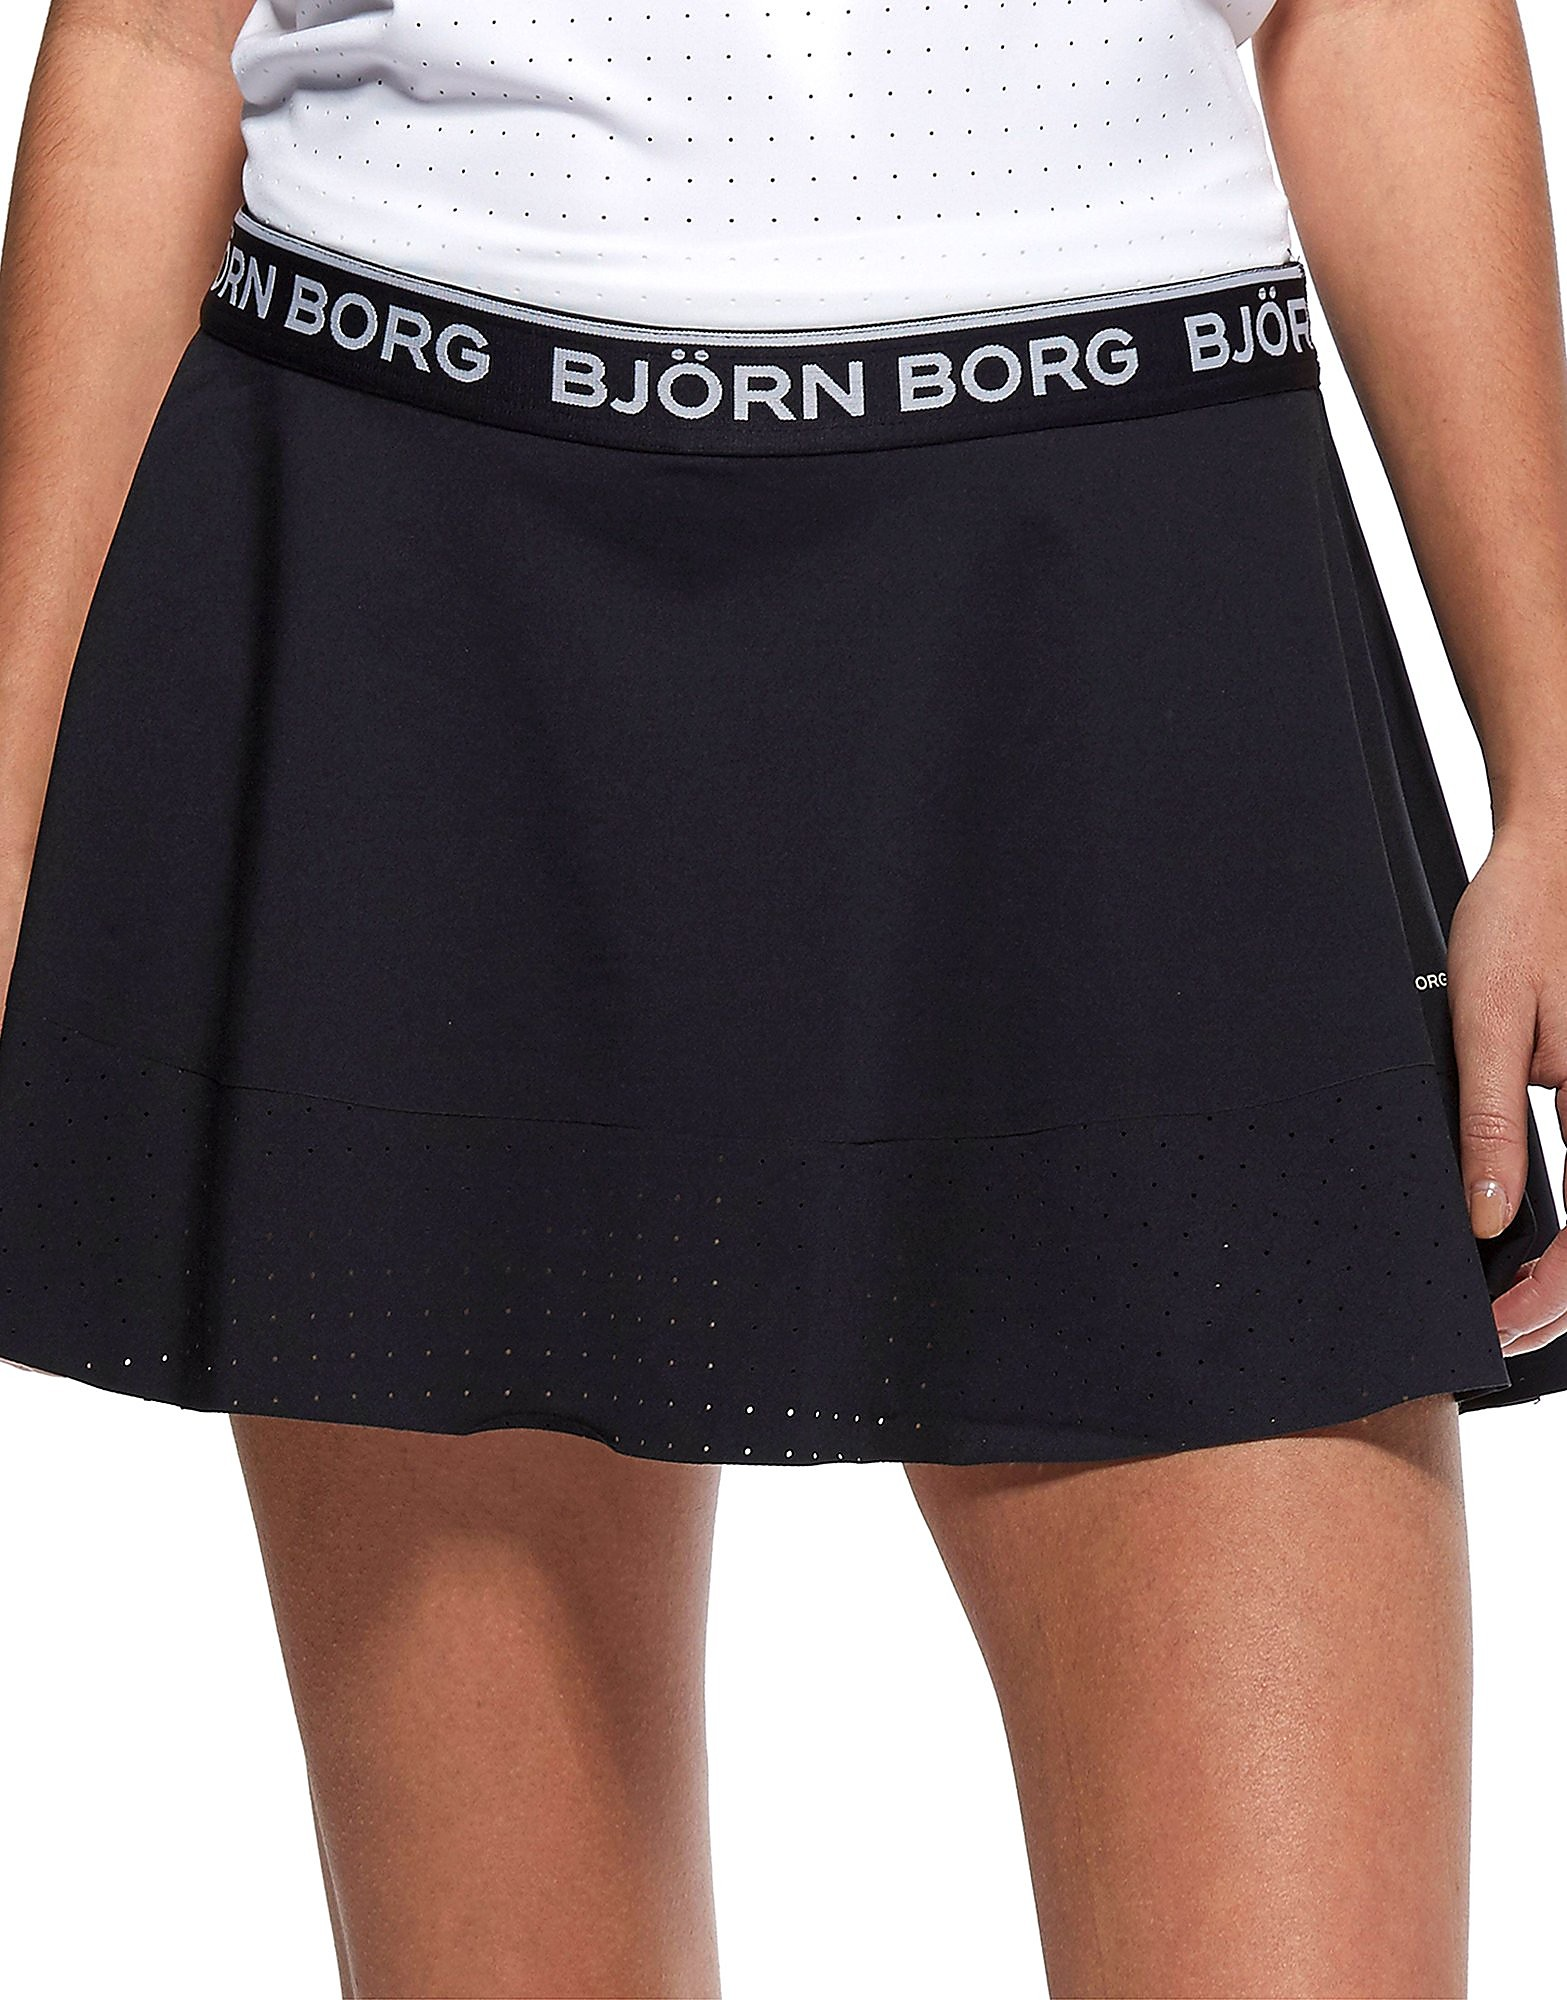 Bjorn Borg Tatum Tennis Skirt Women's